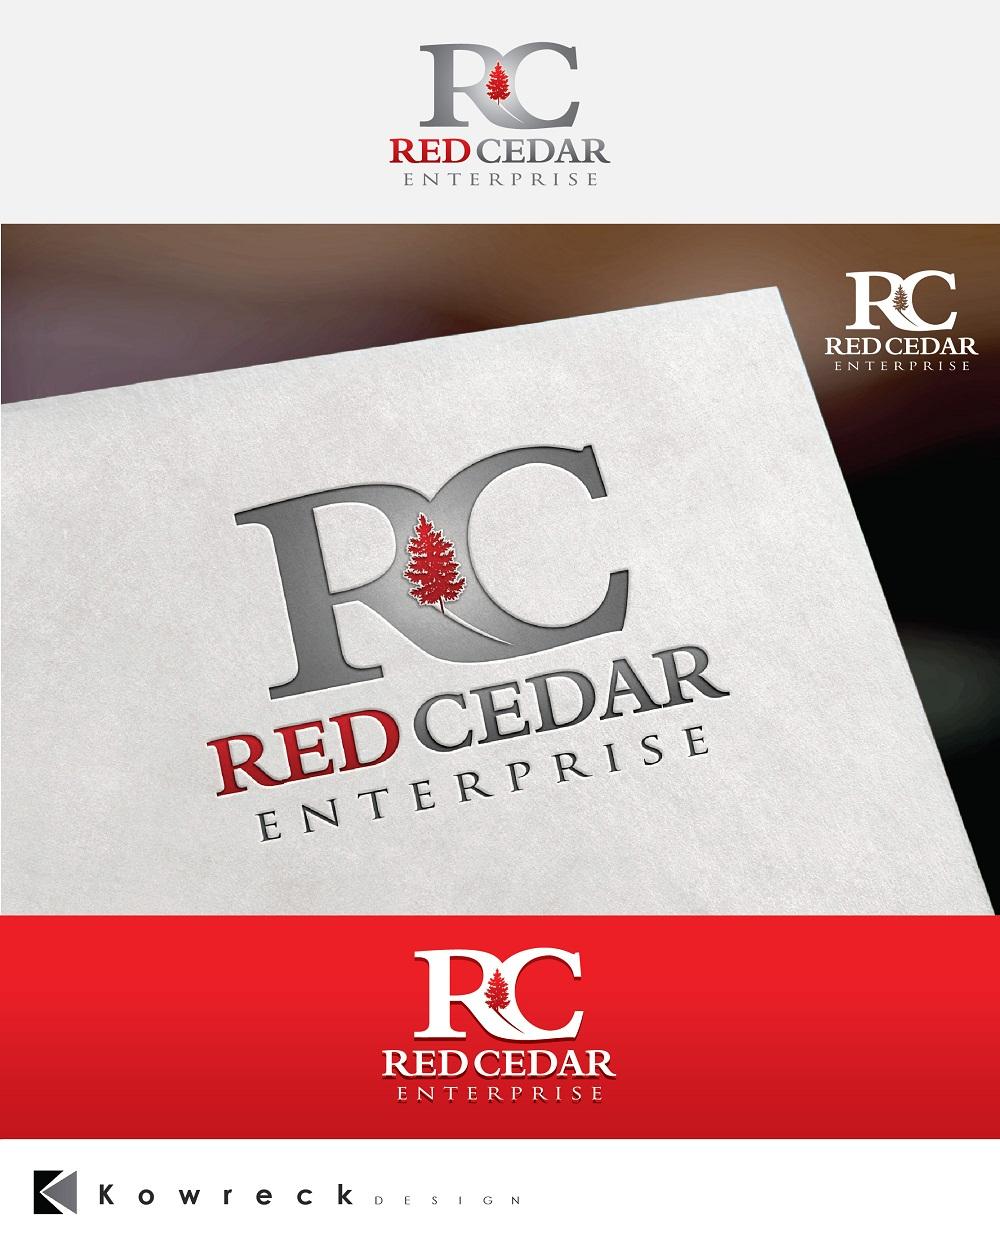 Logo Design by kowreck - Entry No. 80 in the Logo Design Contest Unique Logo Design Wanted for Red Cedar Enterprise.